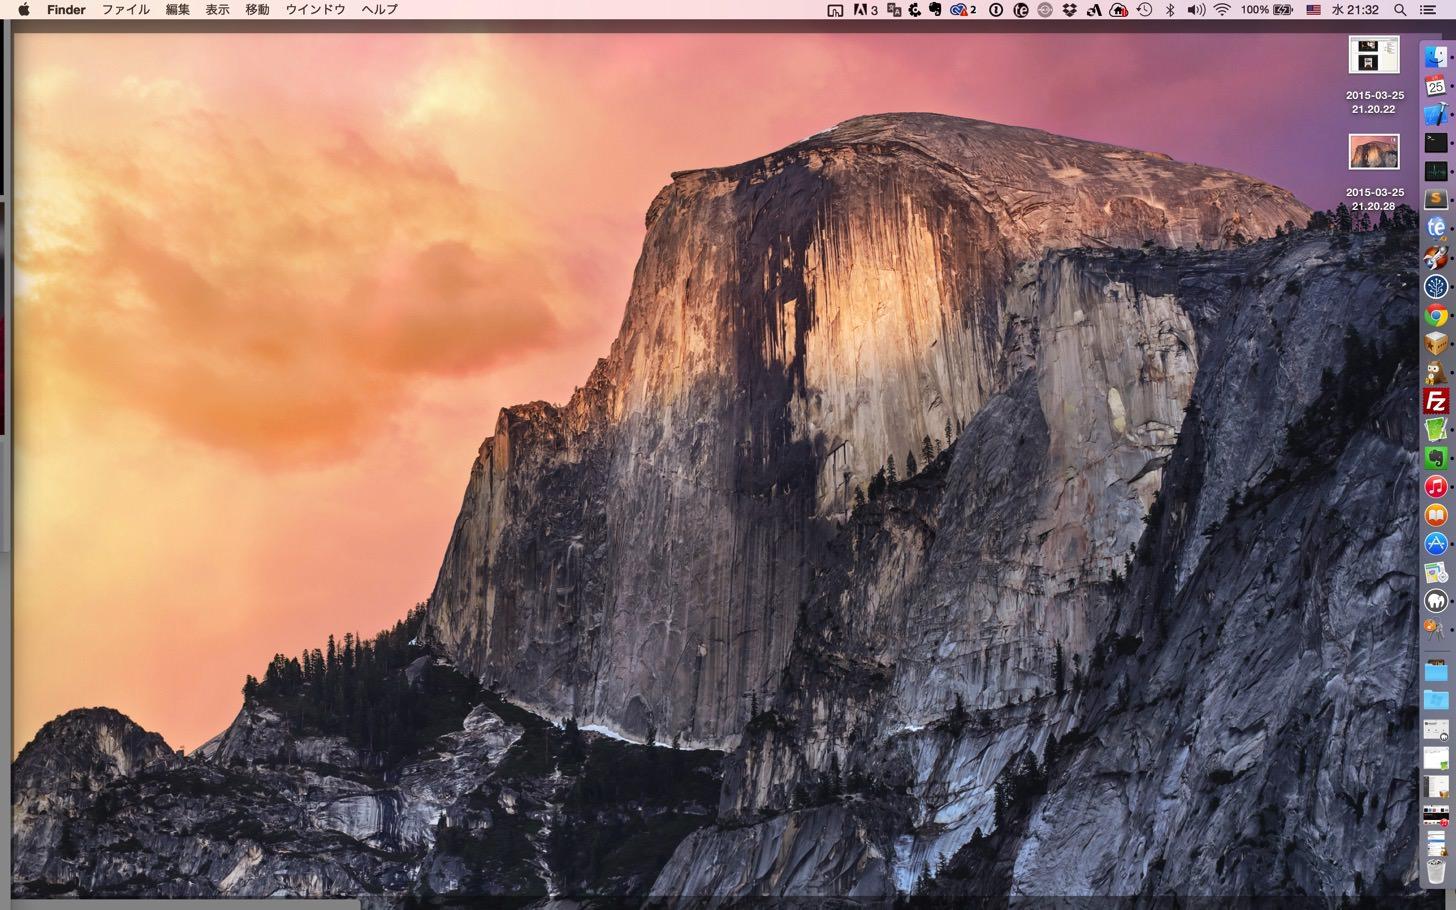 Macのスクリーンショットのファイル名を日付のみに変更する方法。